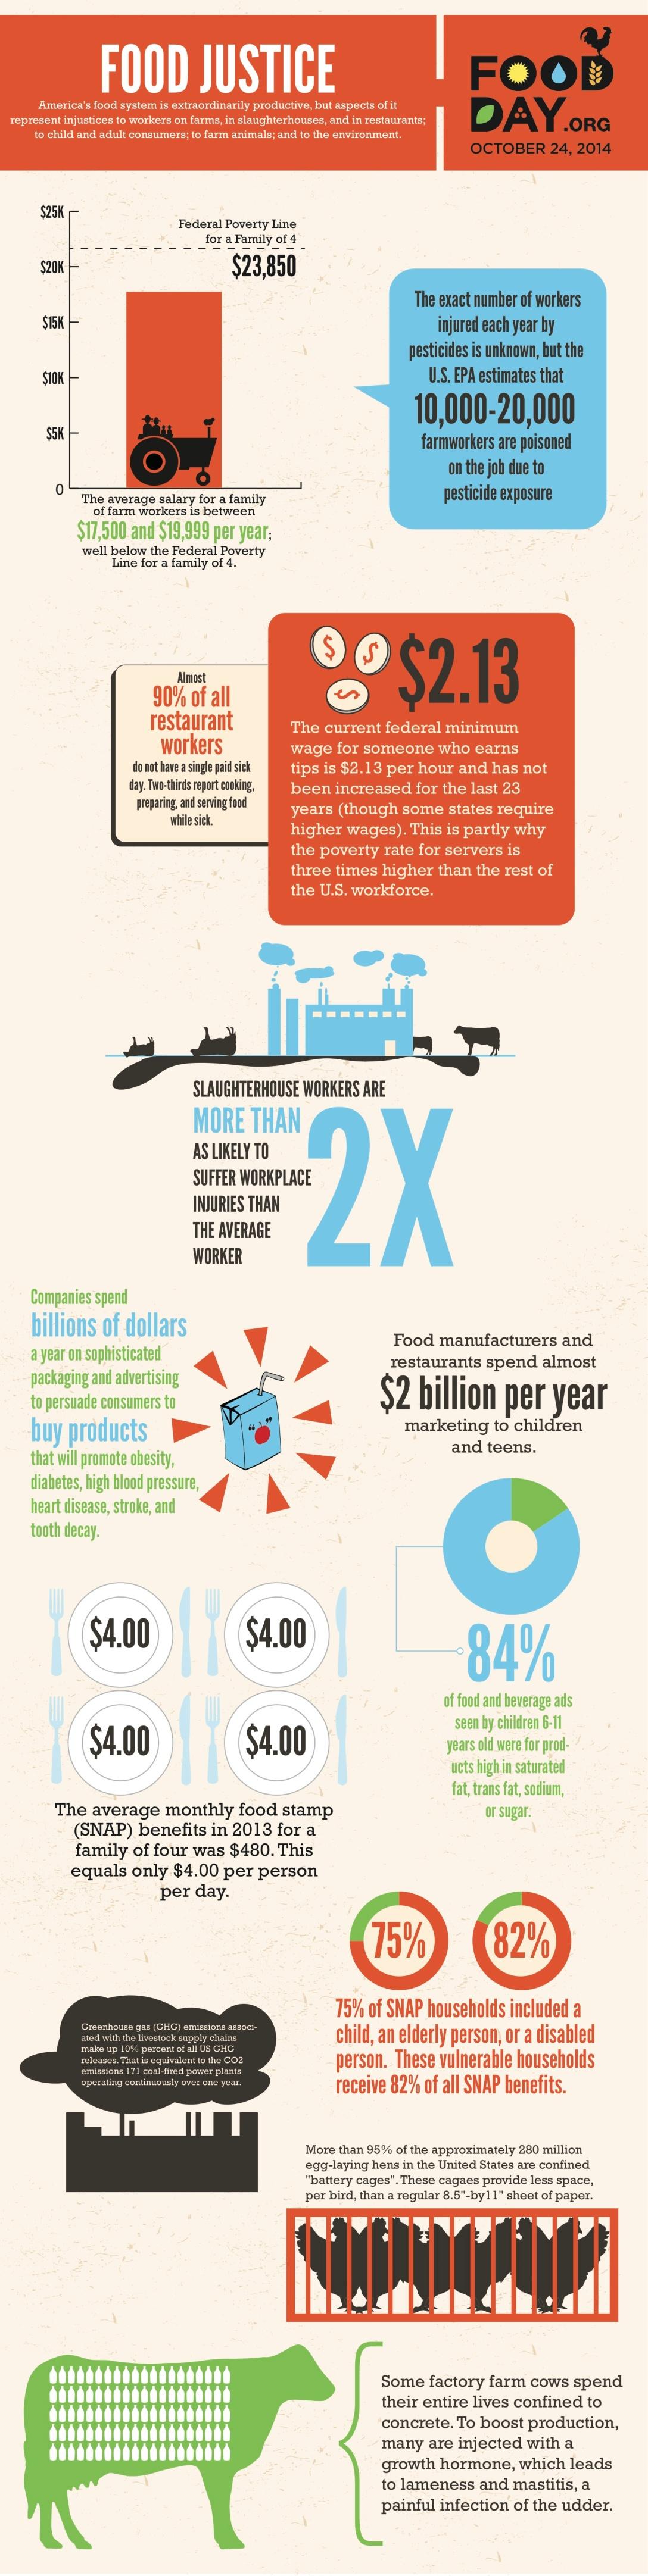 FoodJustice_infographic4